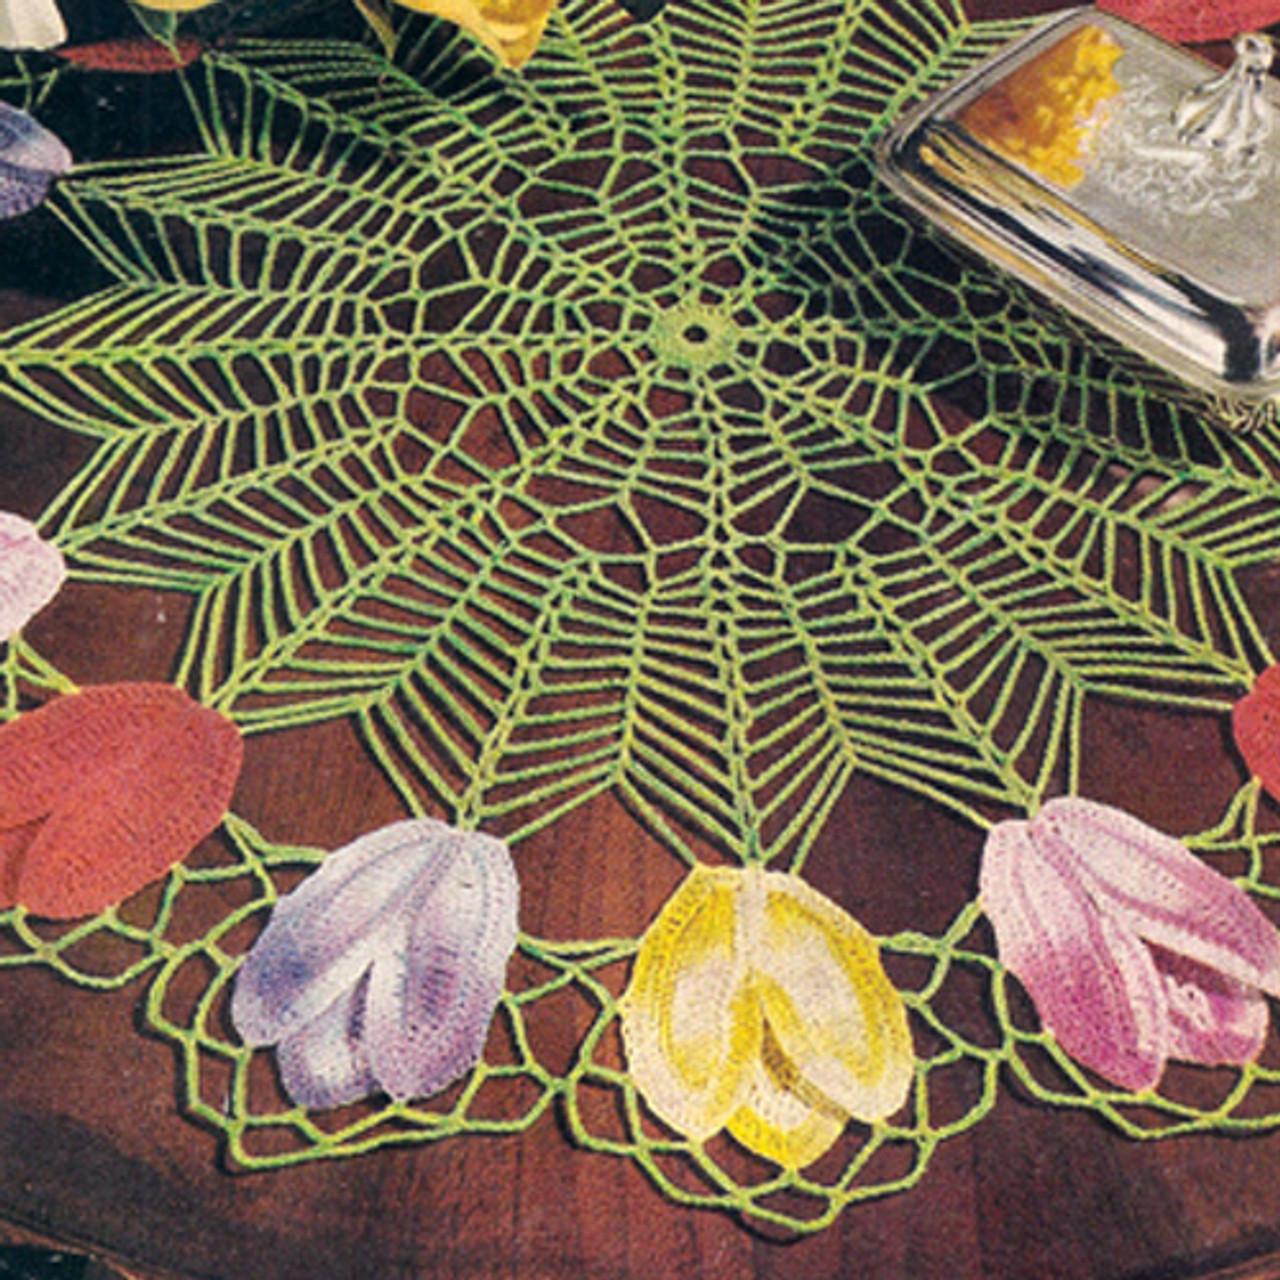 Spiderweb Doily with Tulip Border Crochet Pattern